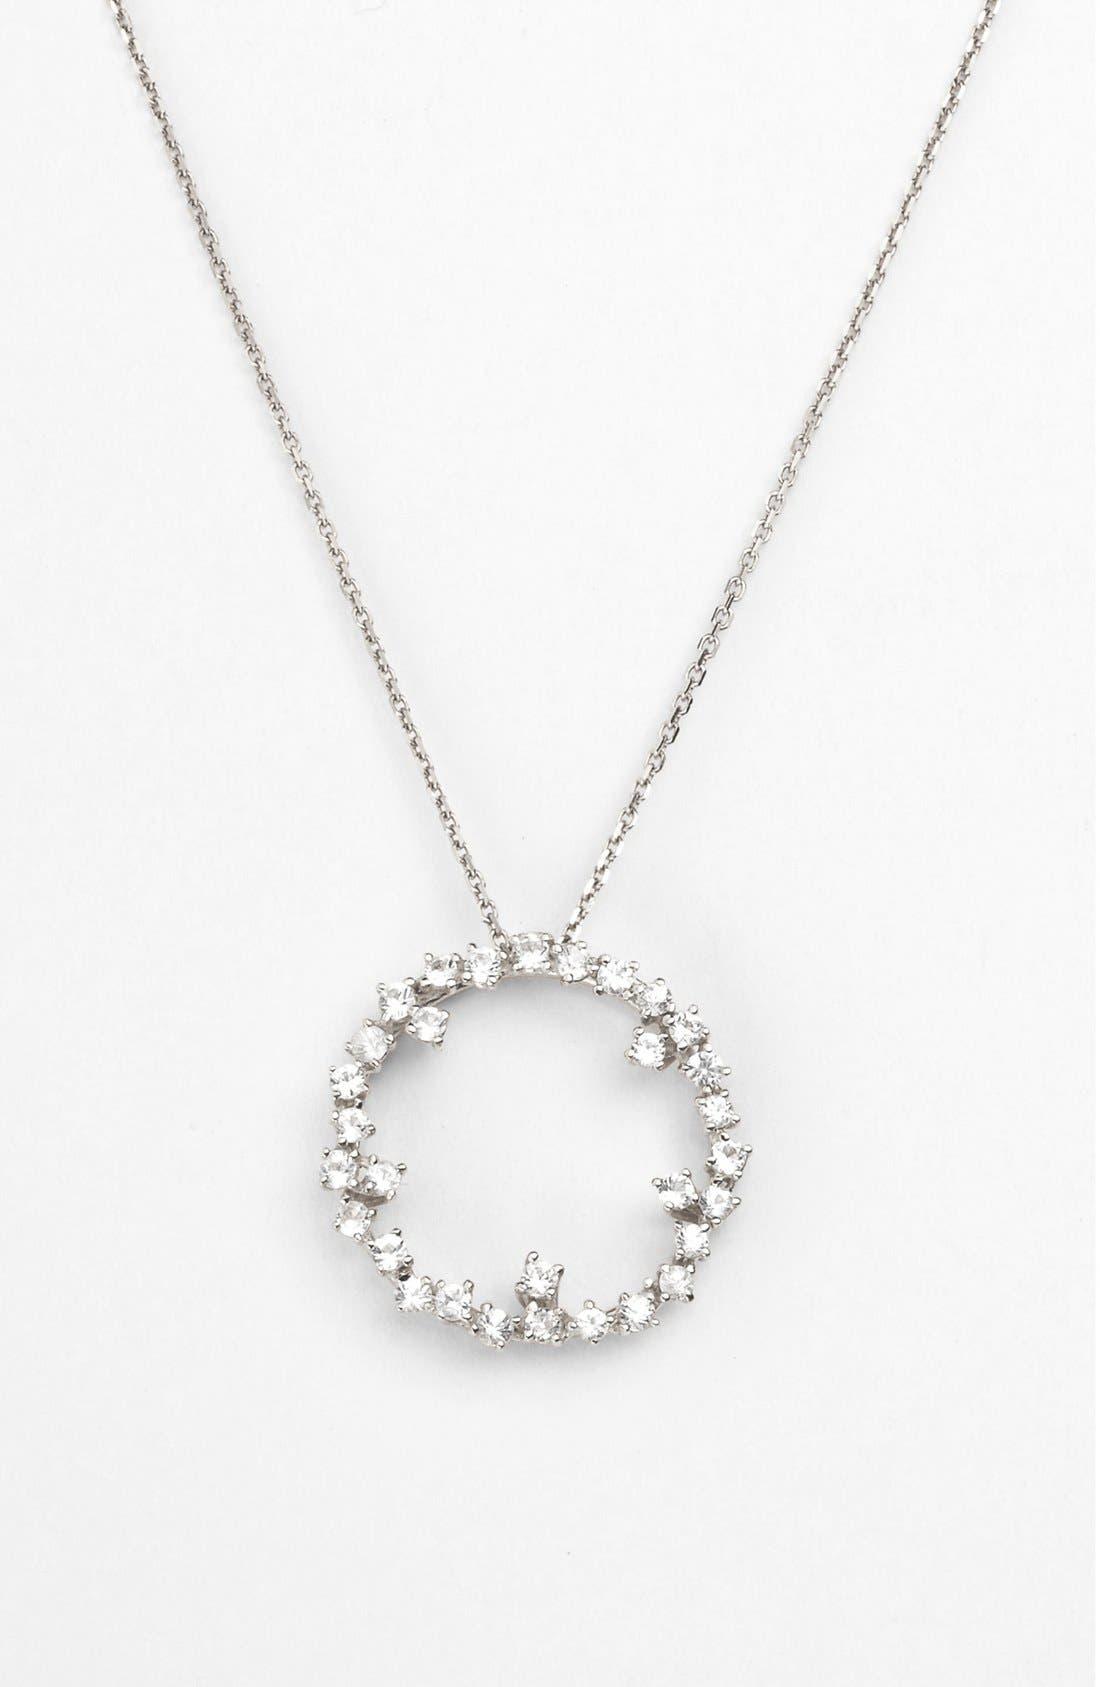 Alternate Image 1 Selected - KALAN by Suzanne Kalan 'Mini Starburst' Pendant Necklace